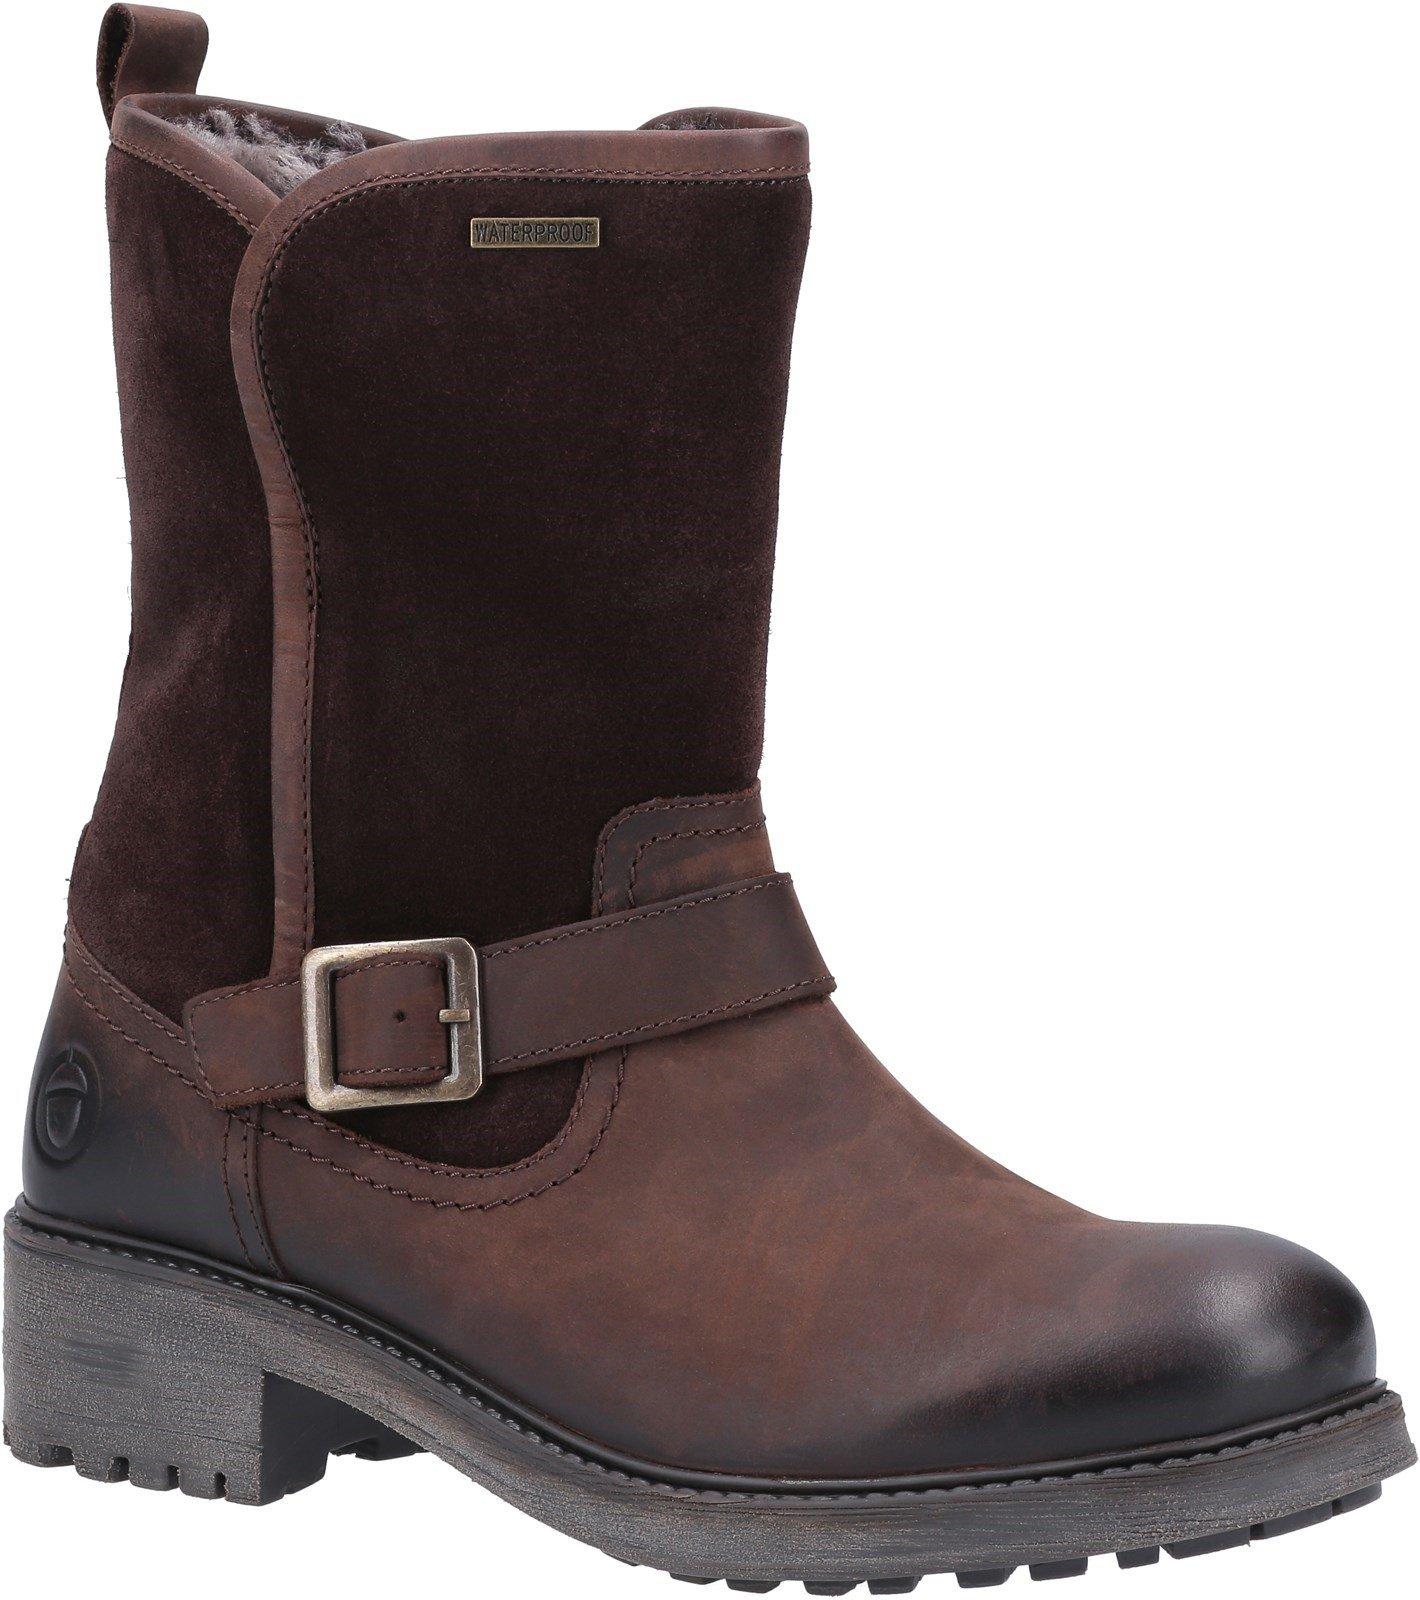 Cotswold Women's Randwick Calf-Length Boots Various Colours 30994 - Brown 6